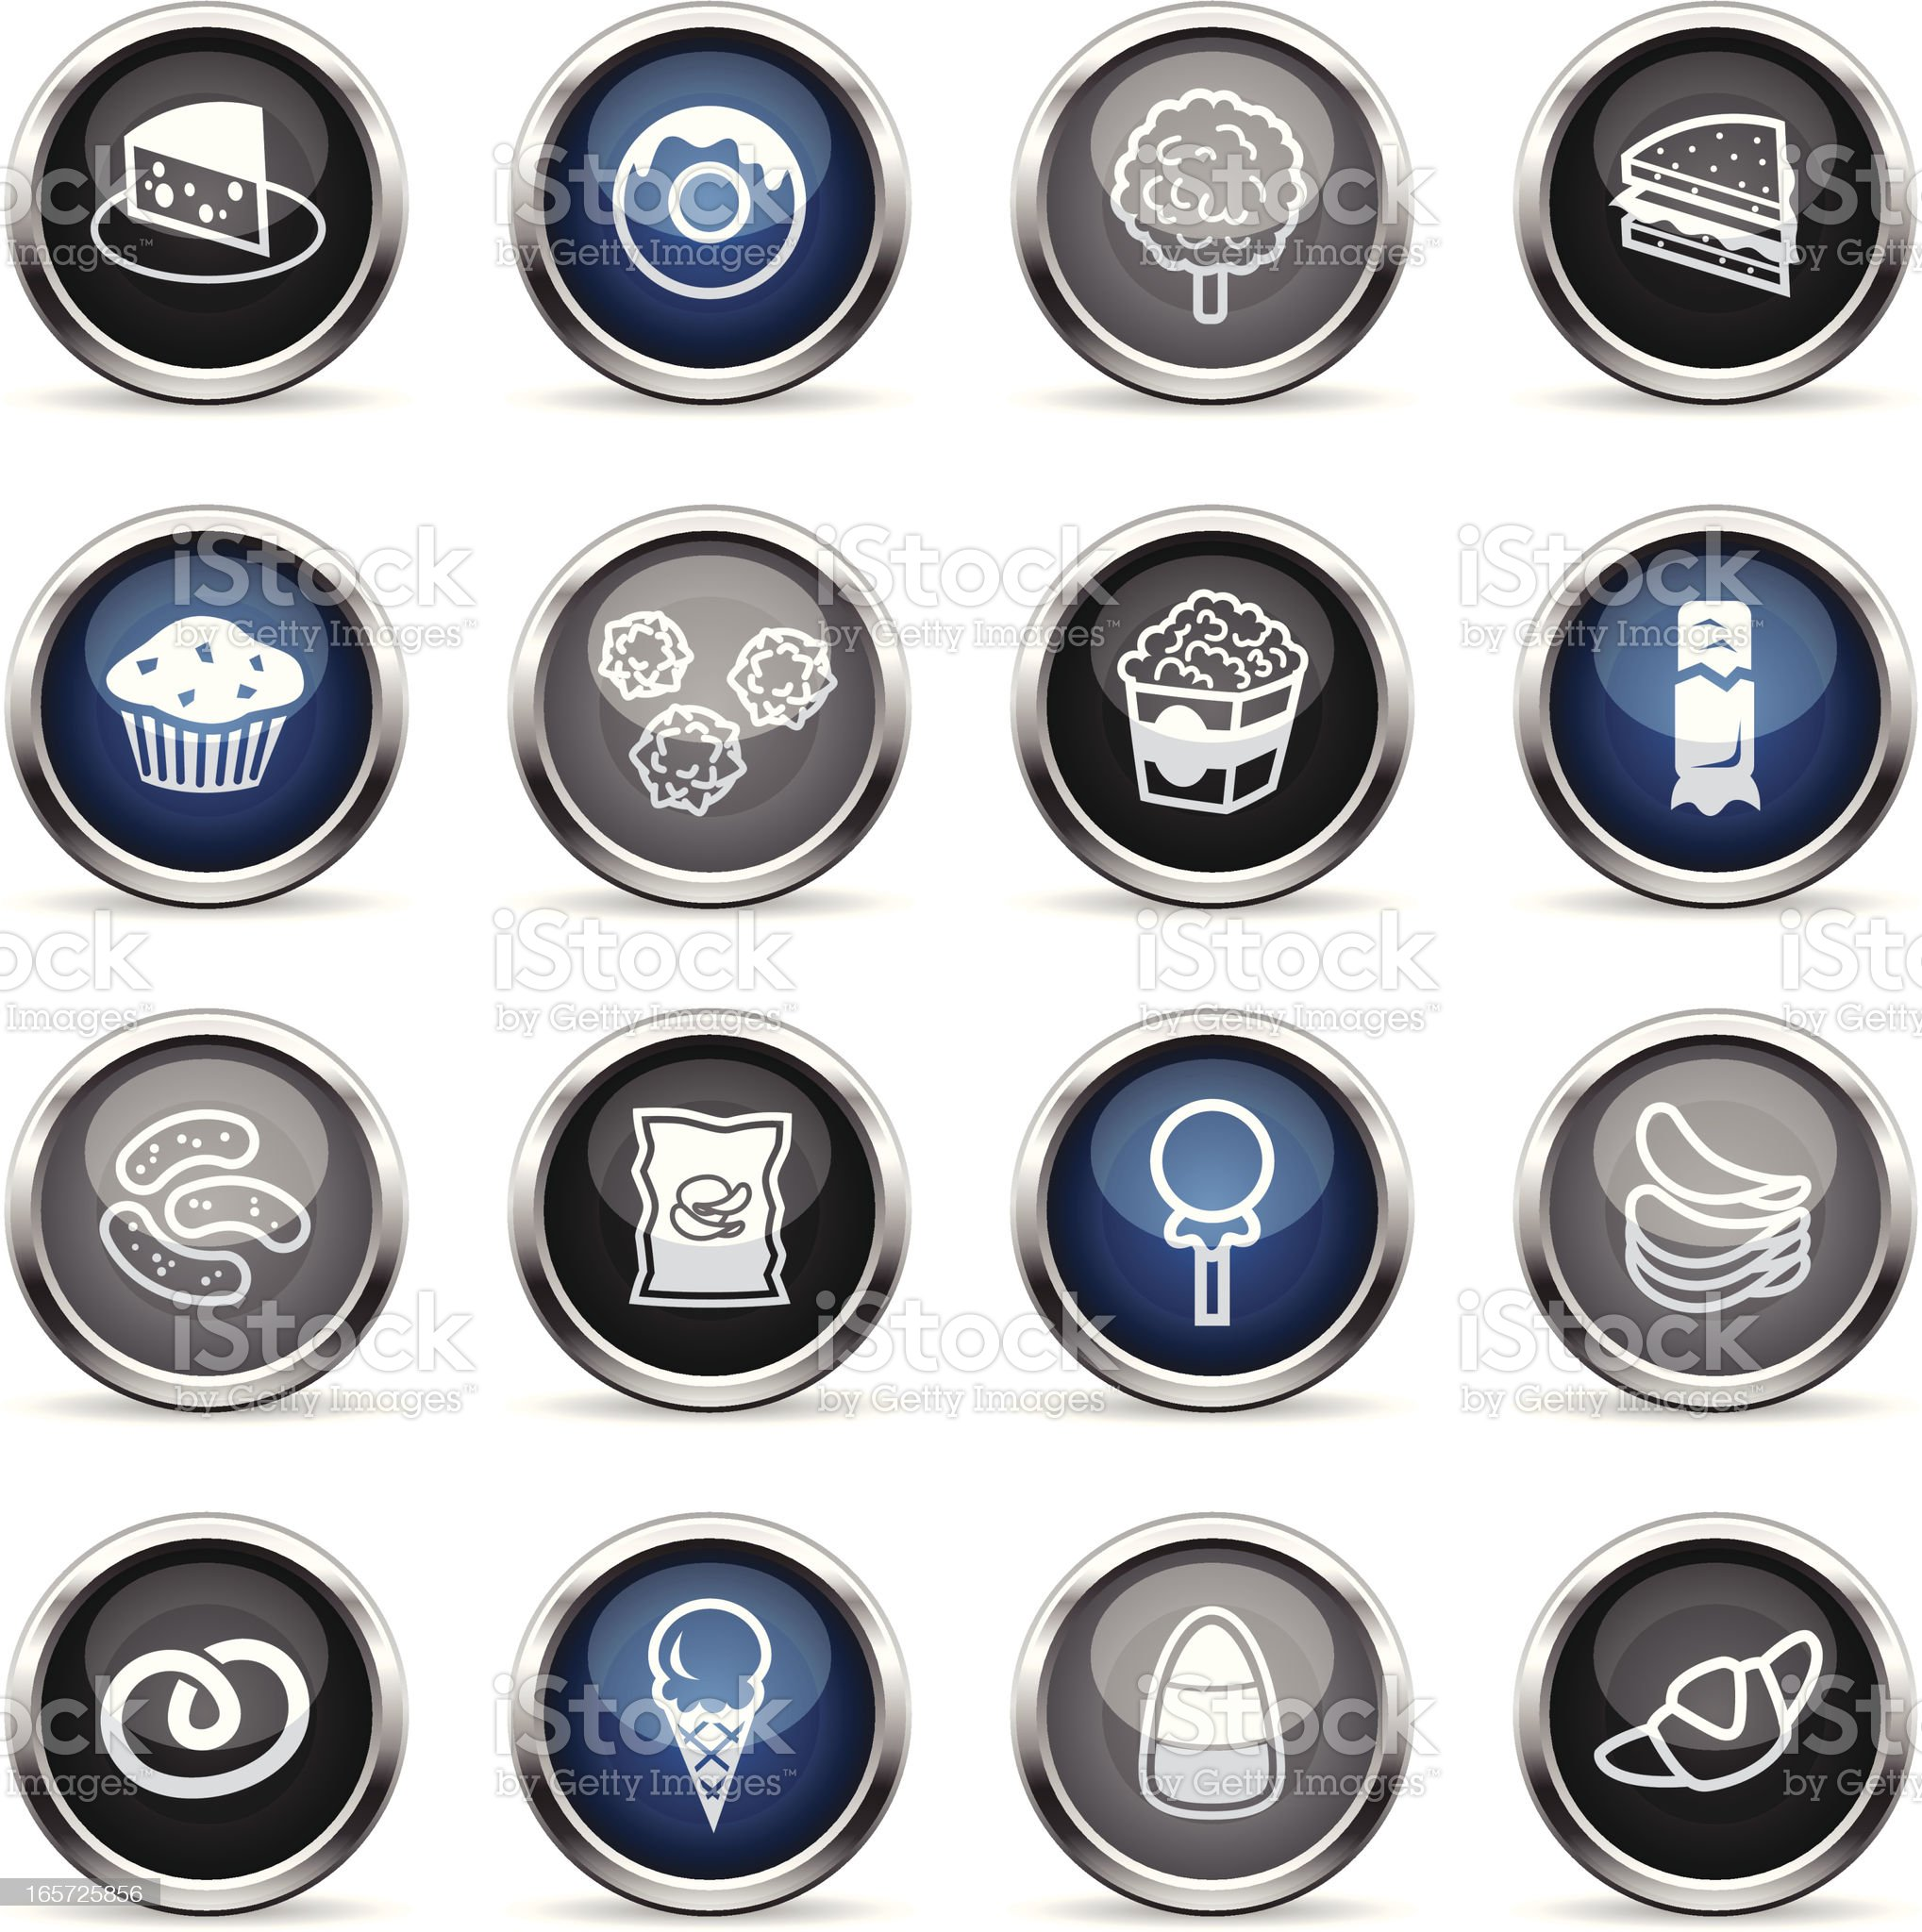 Supergloss Icons - Junk Food royalty-free stock vector art